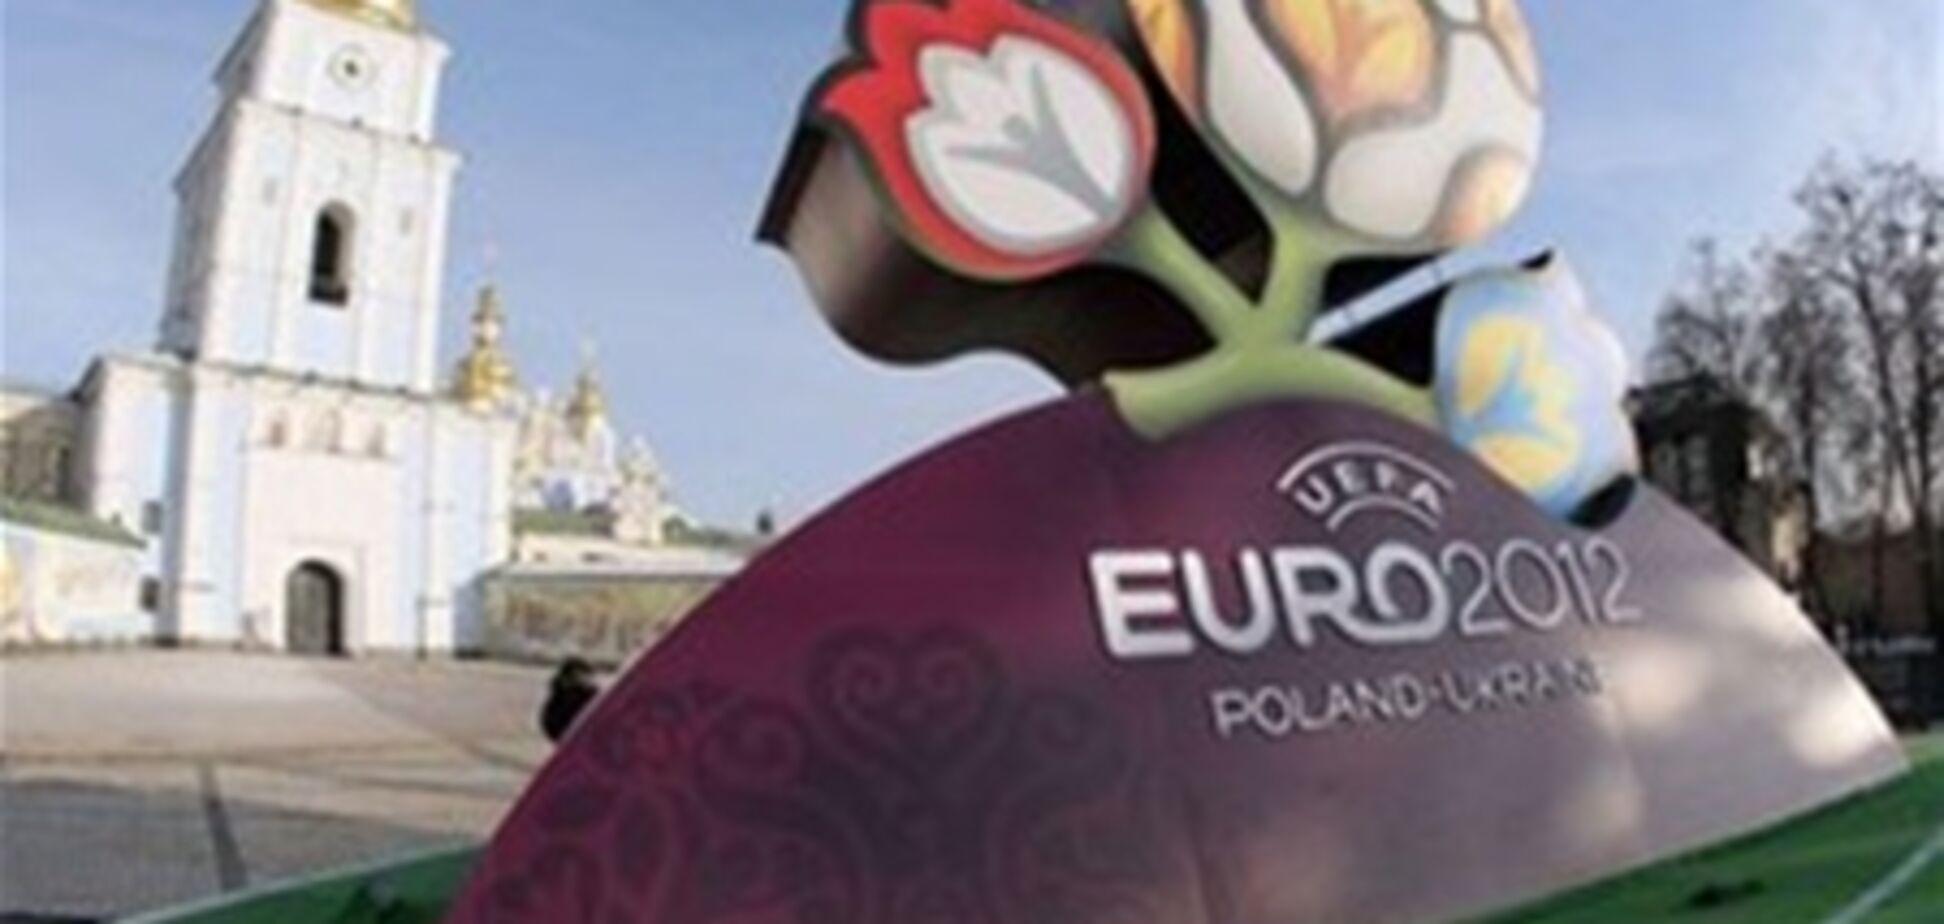 «Евро-2012» не повлияло  позитивно на рынок недвижимости